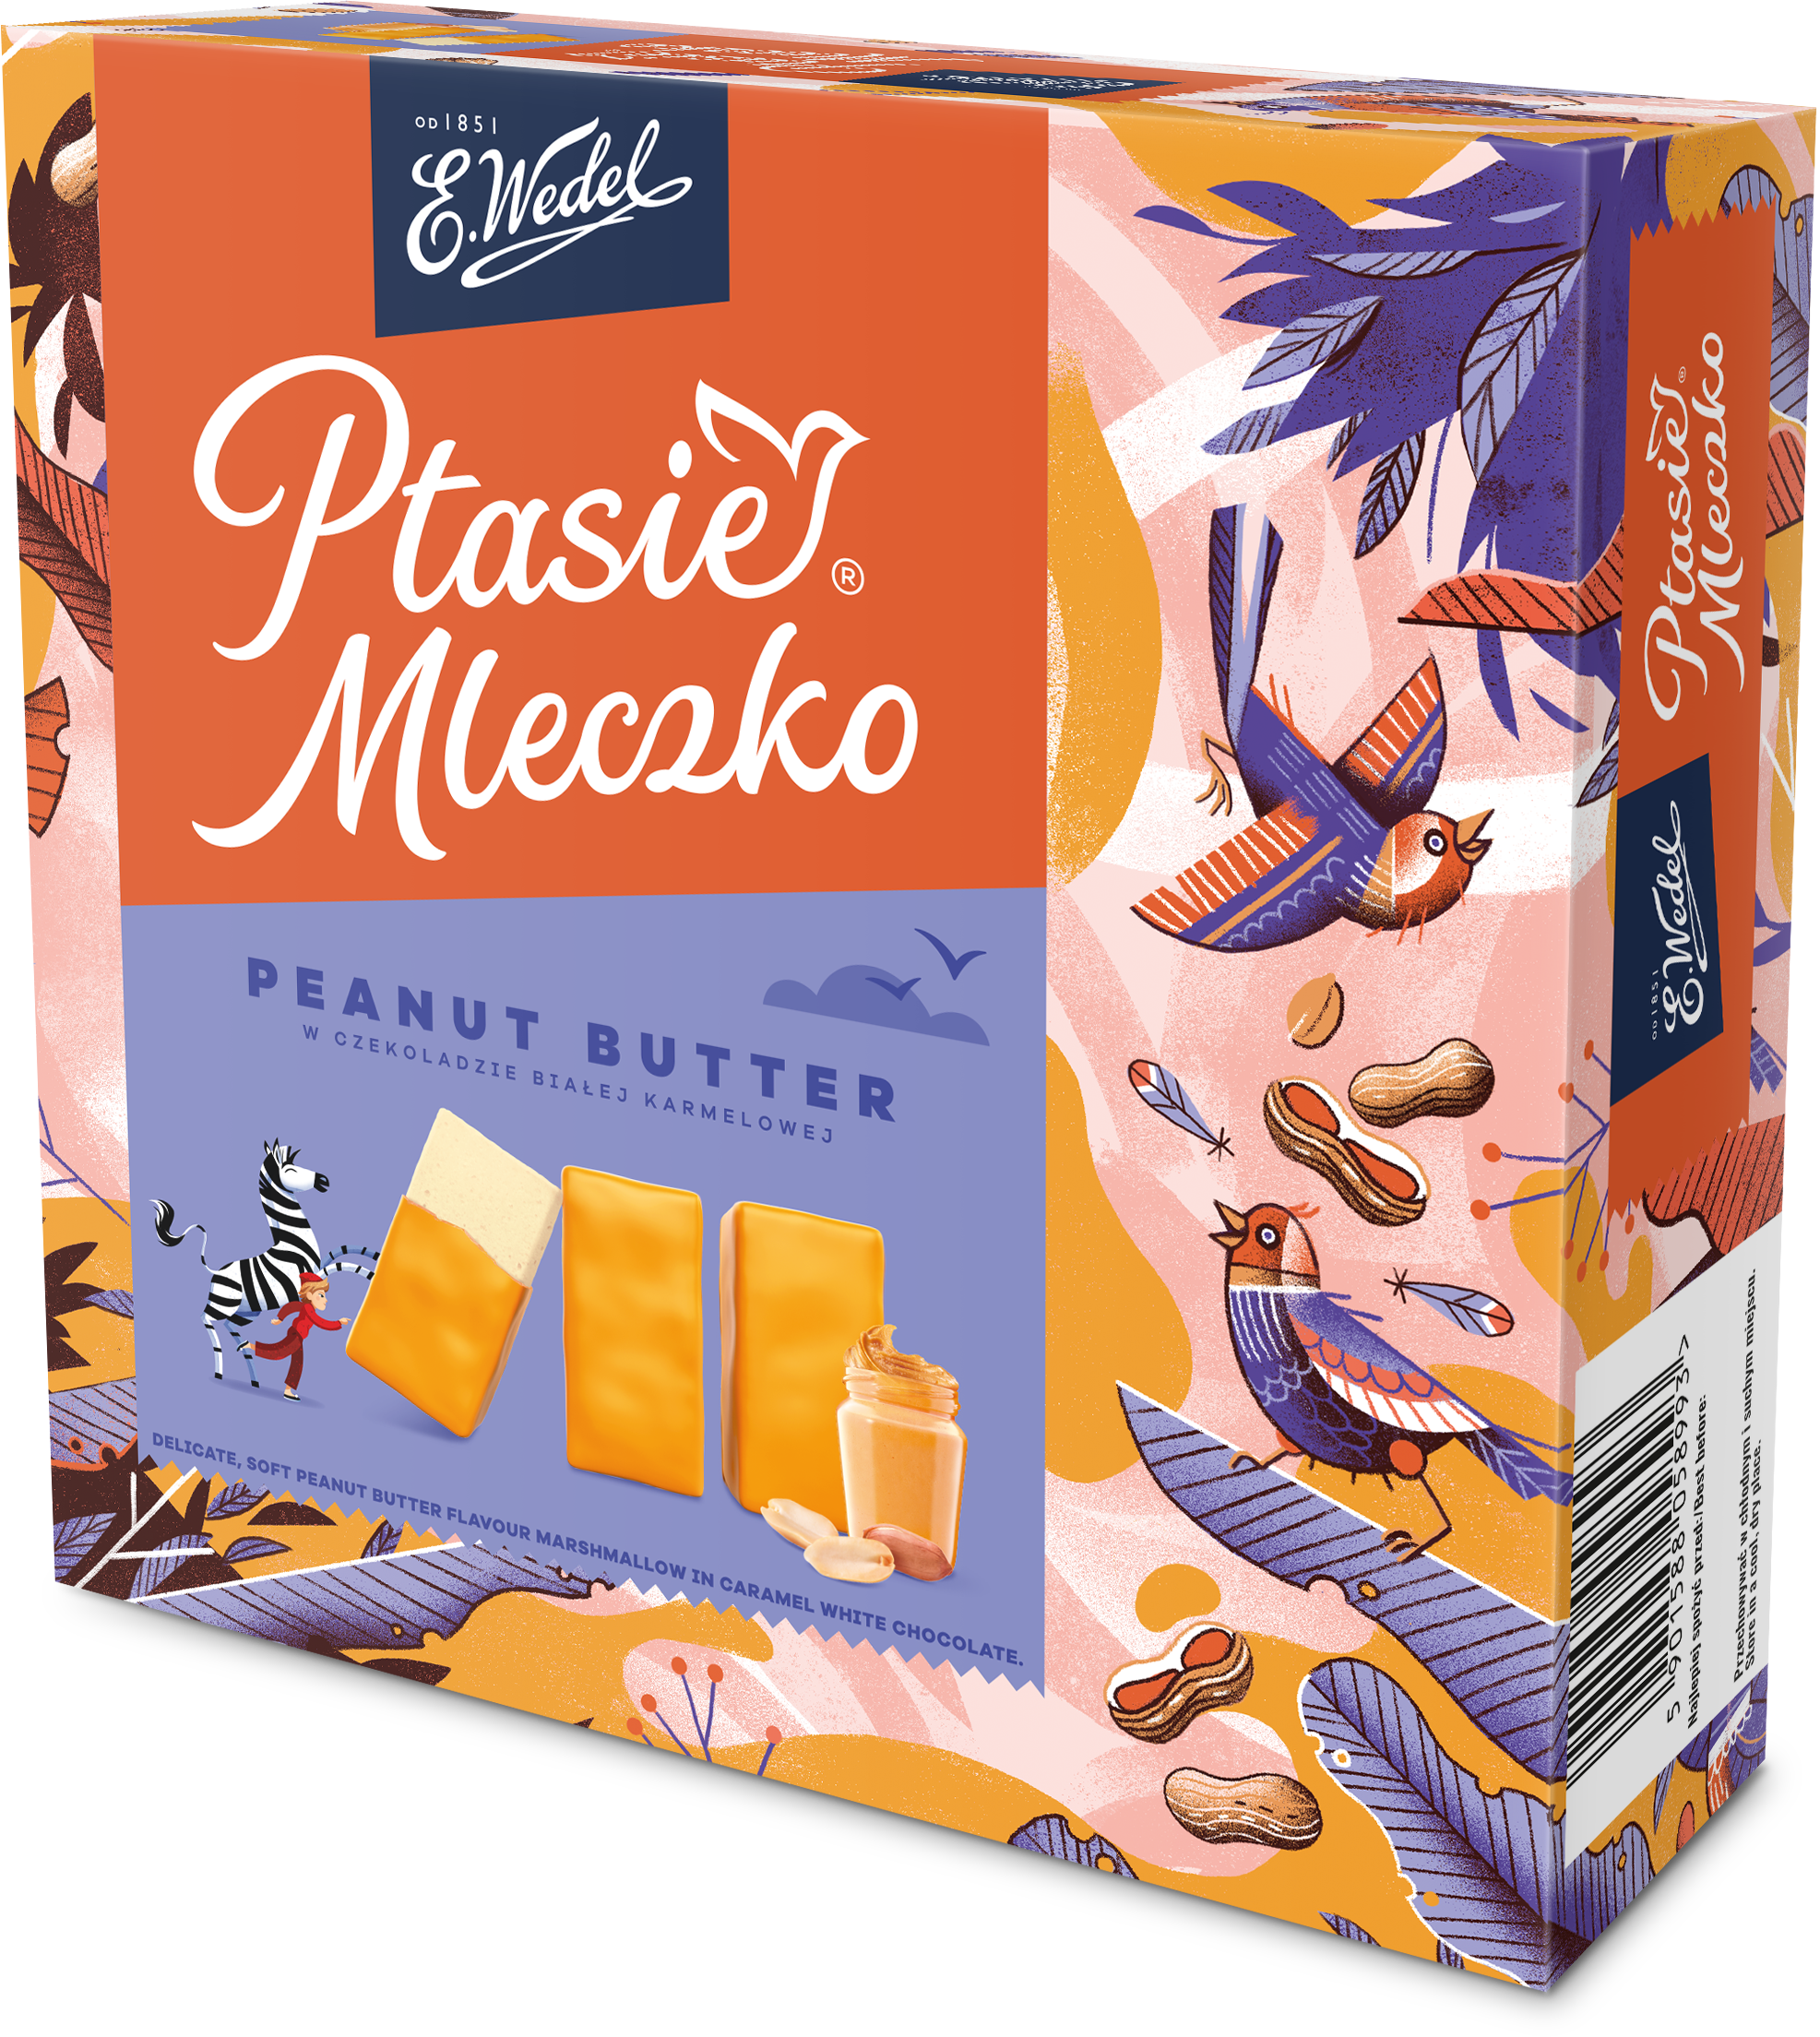 Ptasie Mleczko Peanut Butter powraca